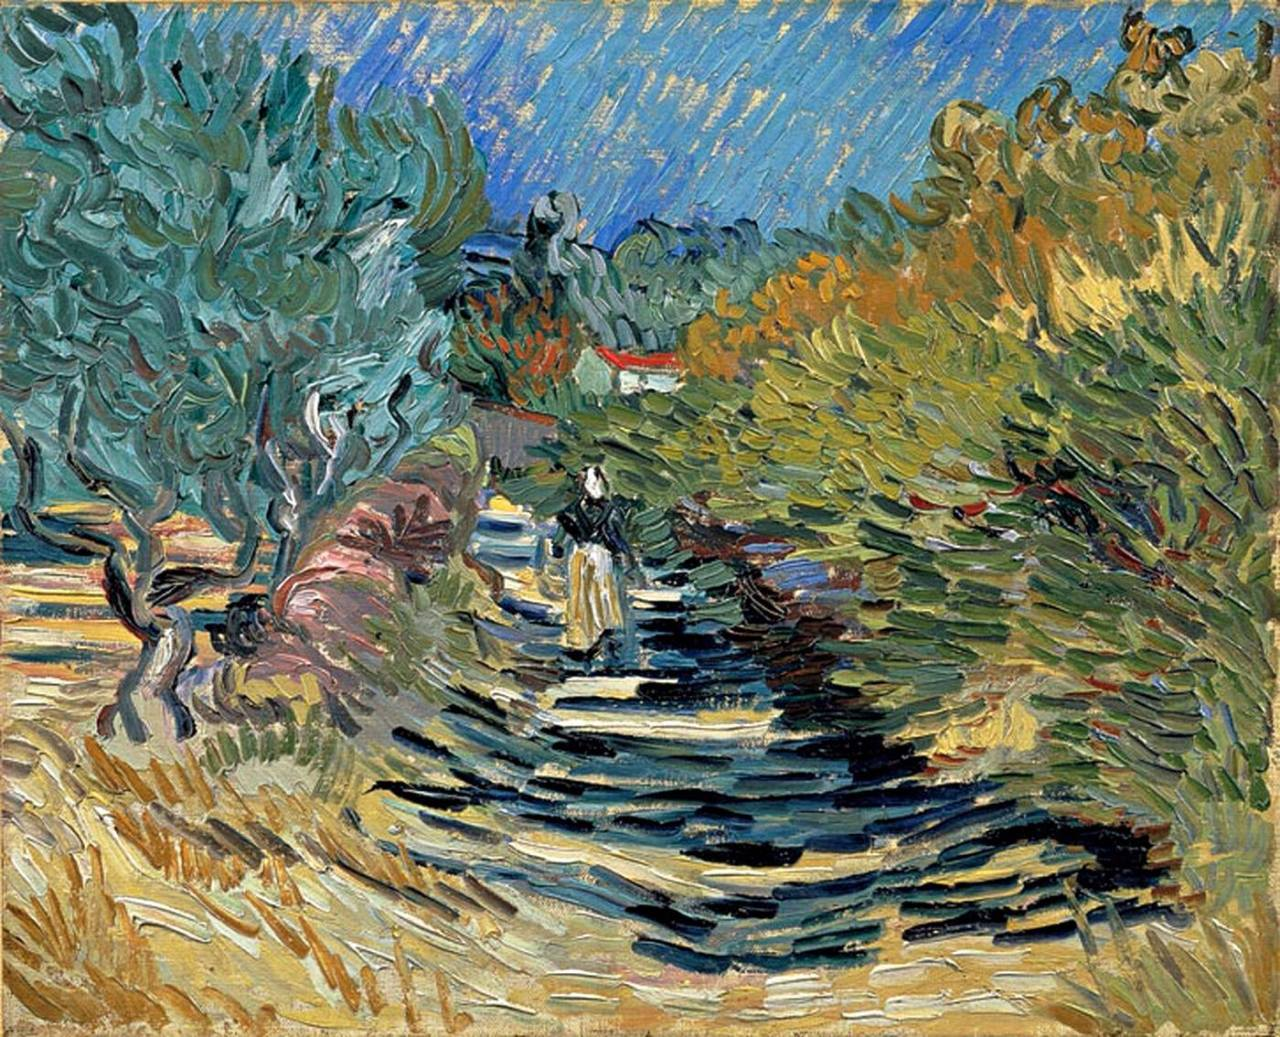 Van Gogh, Path at Saint-Remy, December 1889. Oil on canvas, 32.2 x 40.5 cm. Kasama Nichido Museum of Art, Japan.